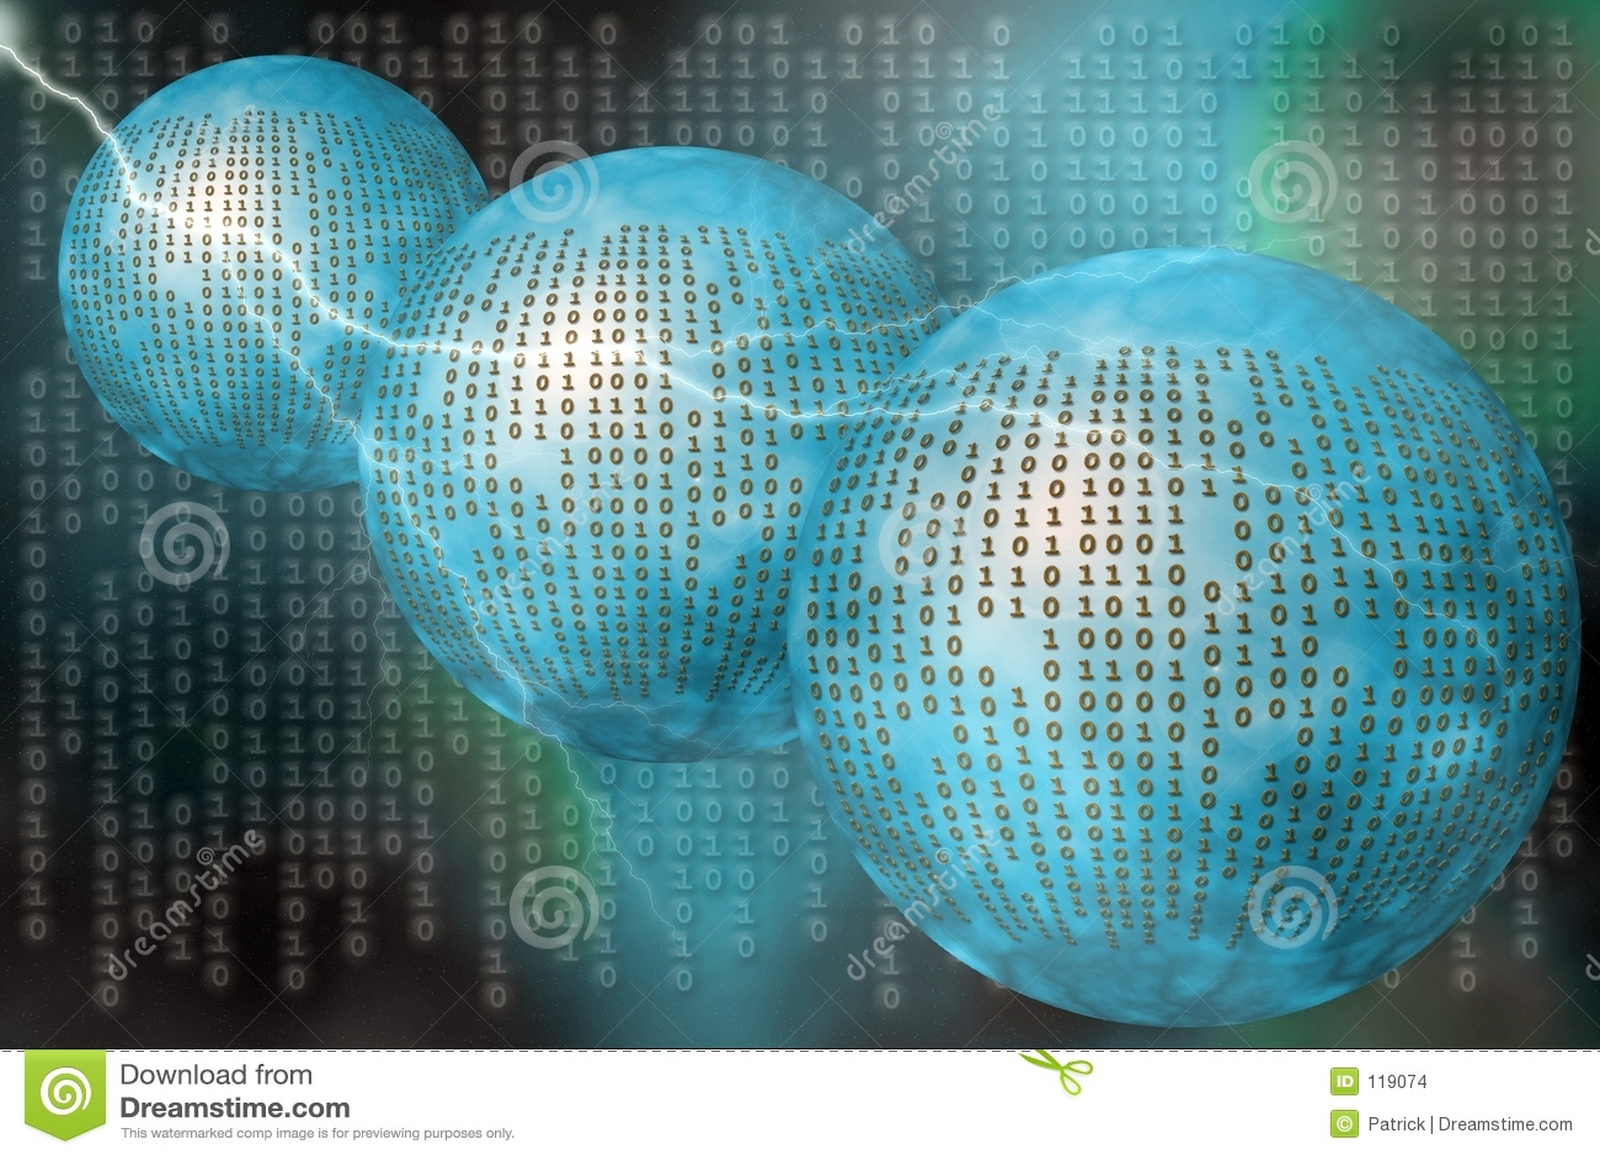 Matrix, binary code.